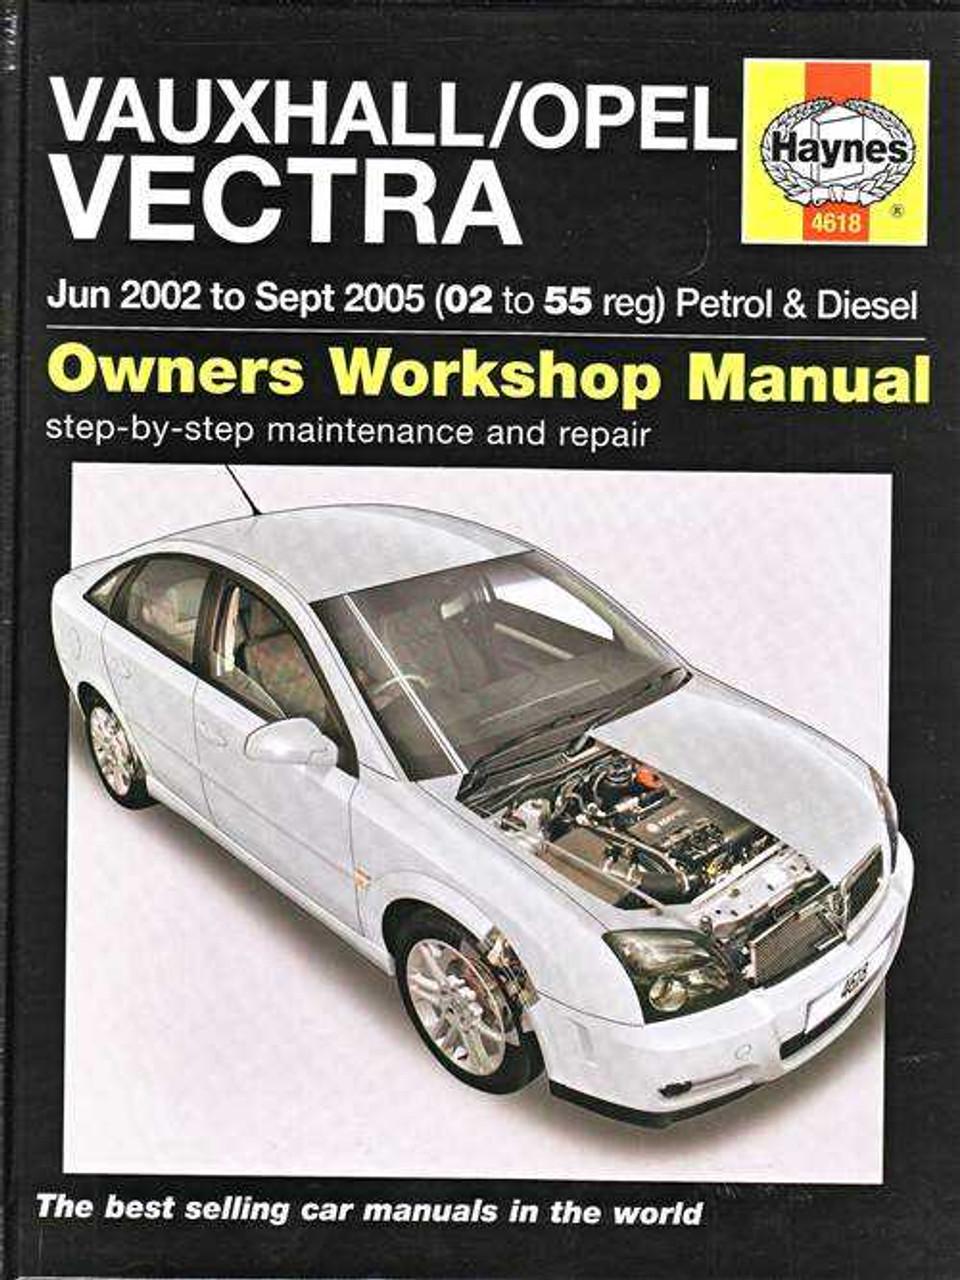 holden vectra 2002 2005 workshop manual rh automotobookshop com au opel vectra 1992 service manual opel vectra service manual free download